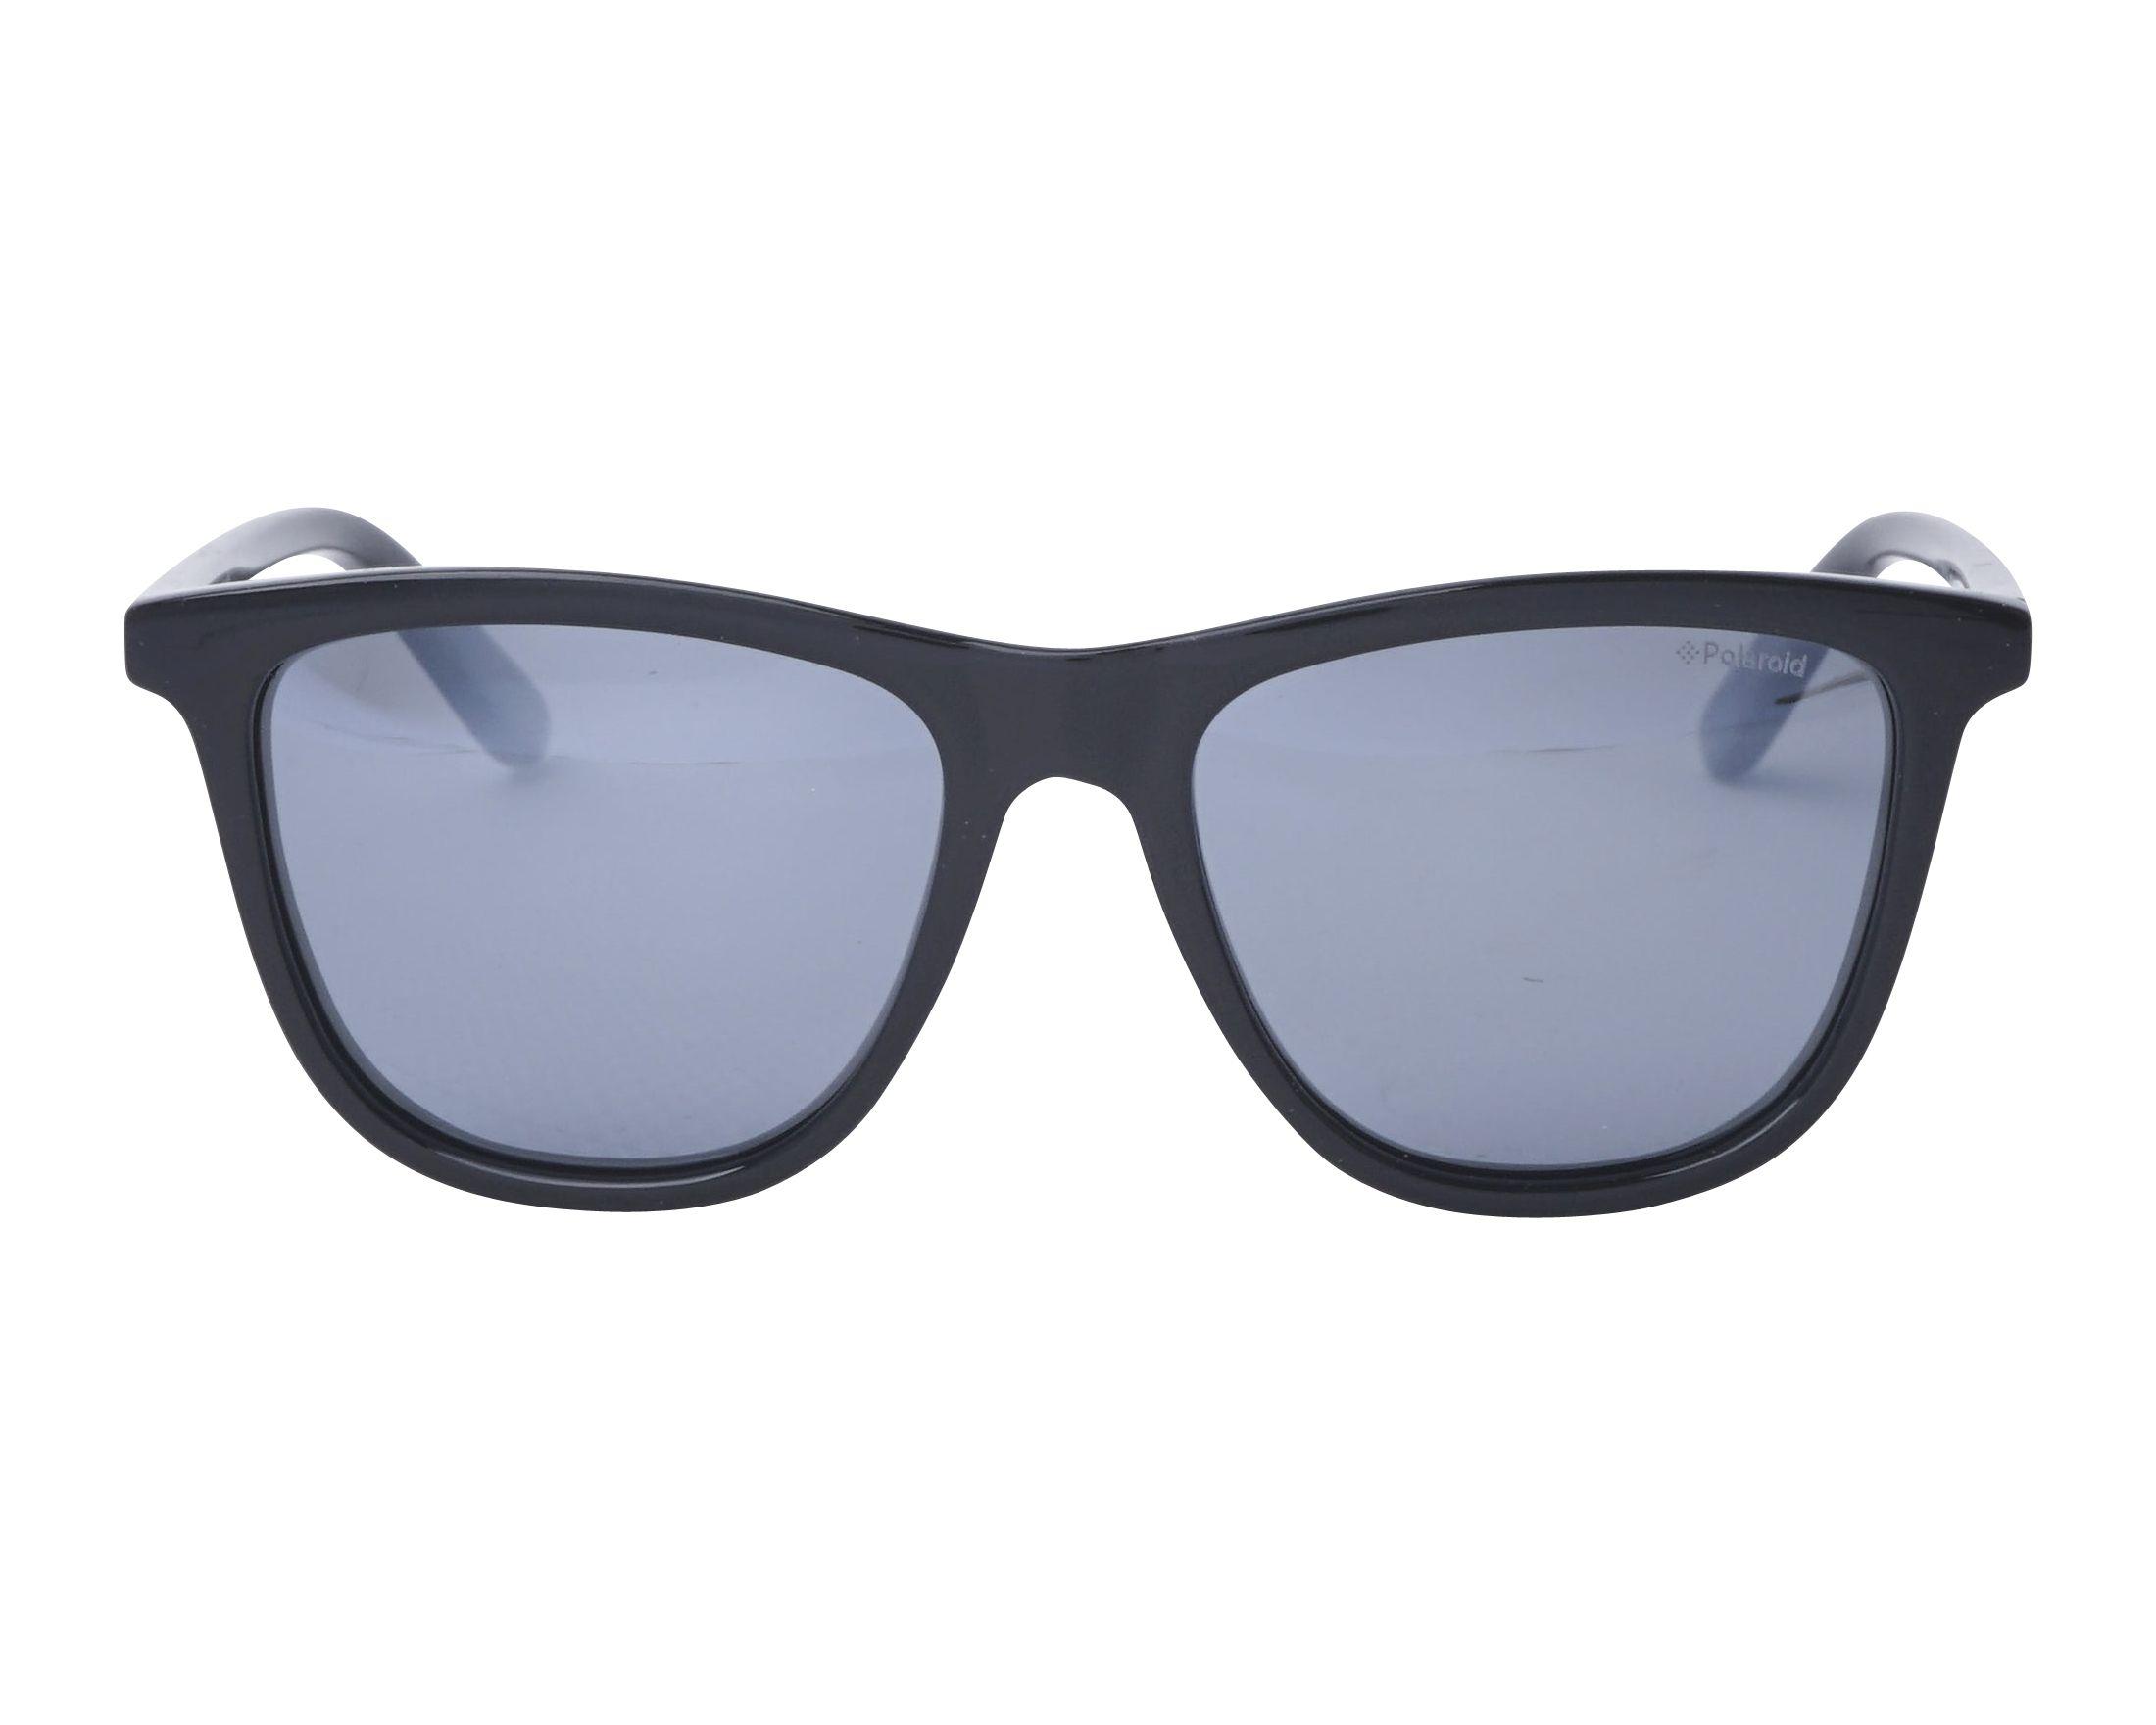 1ae3d2df78 Sunglasses Polaroid PLD-8027-S 807EX 47-15 Black front view